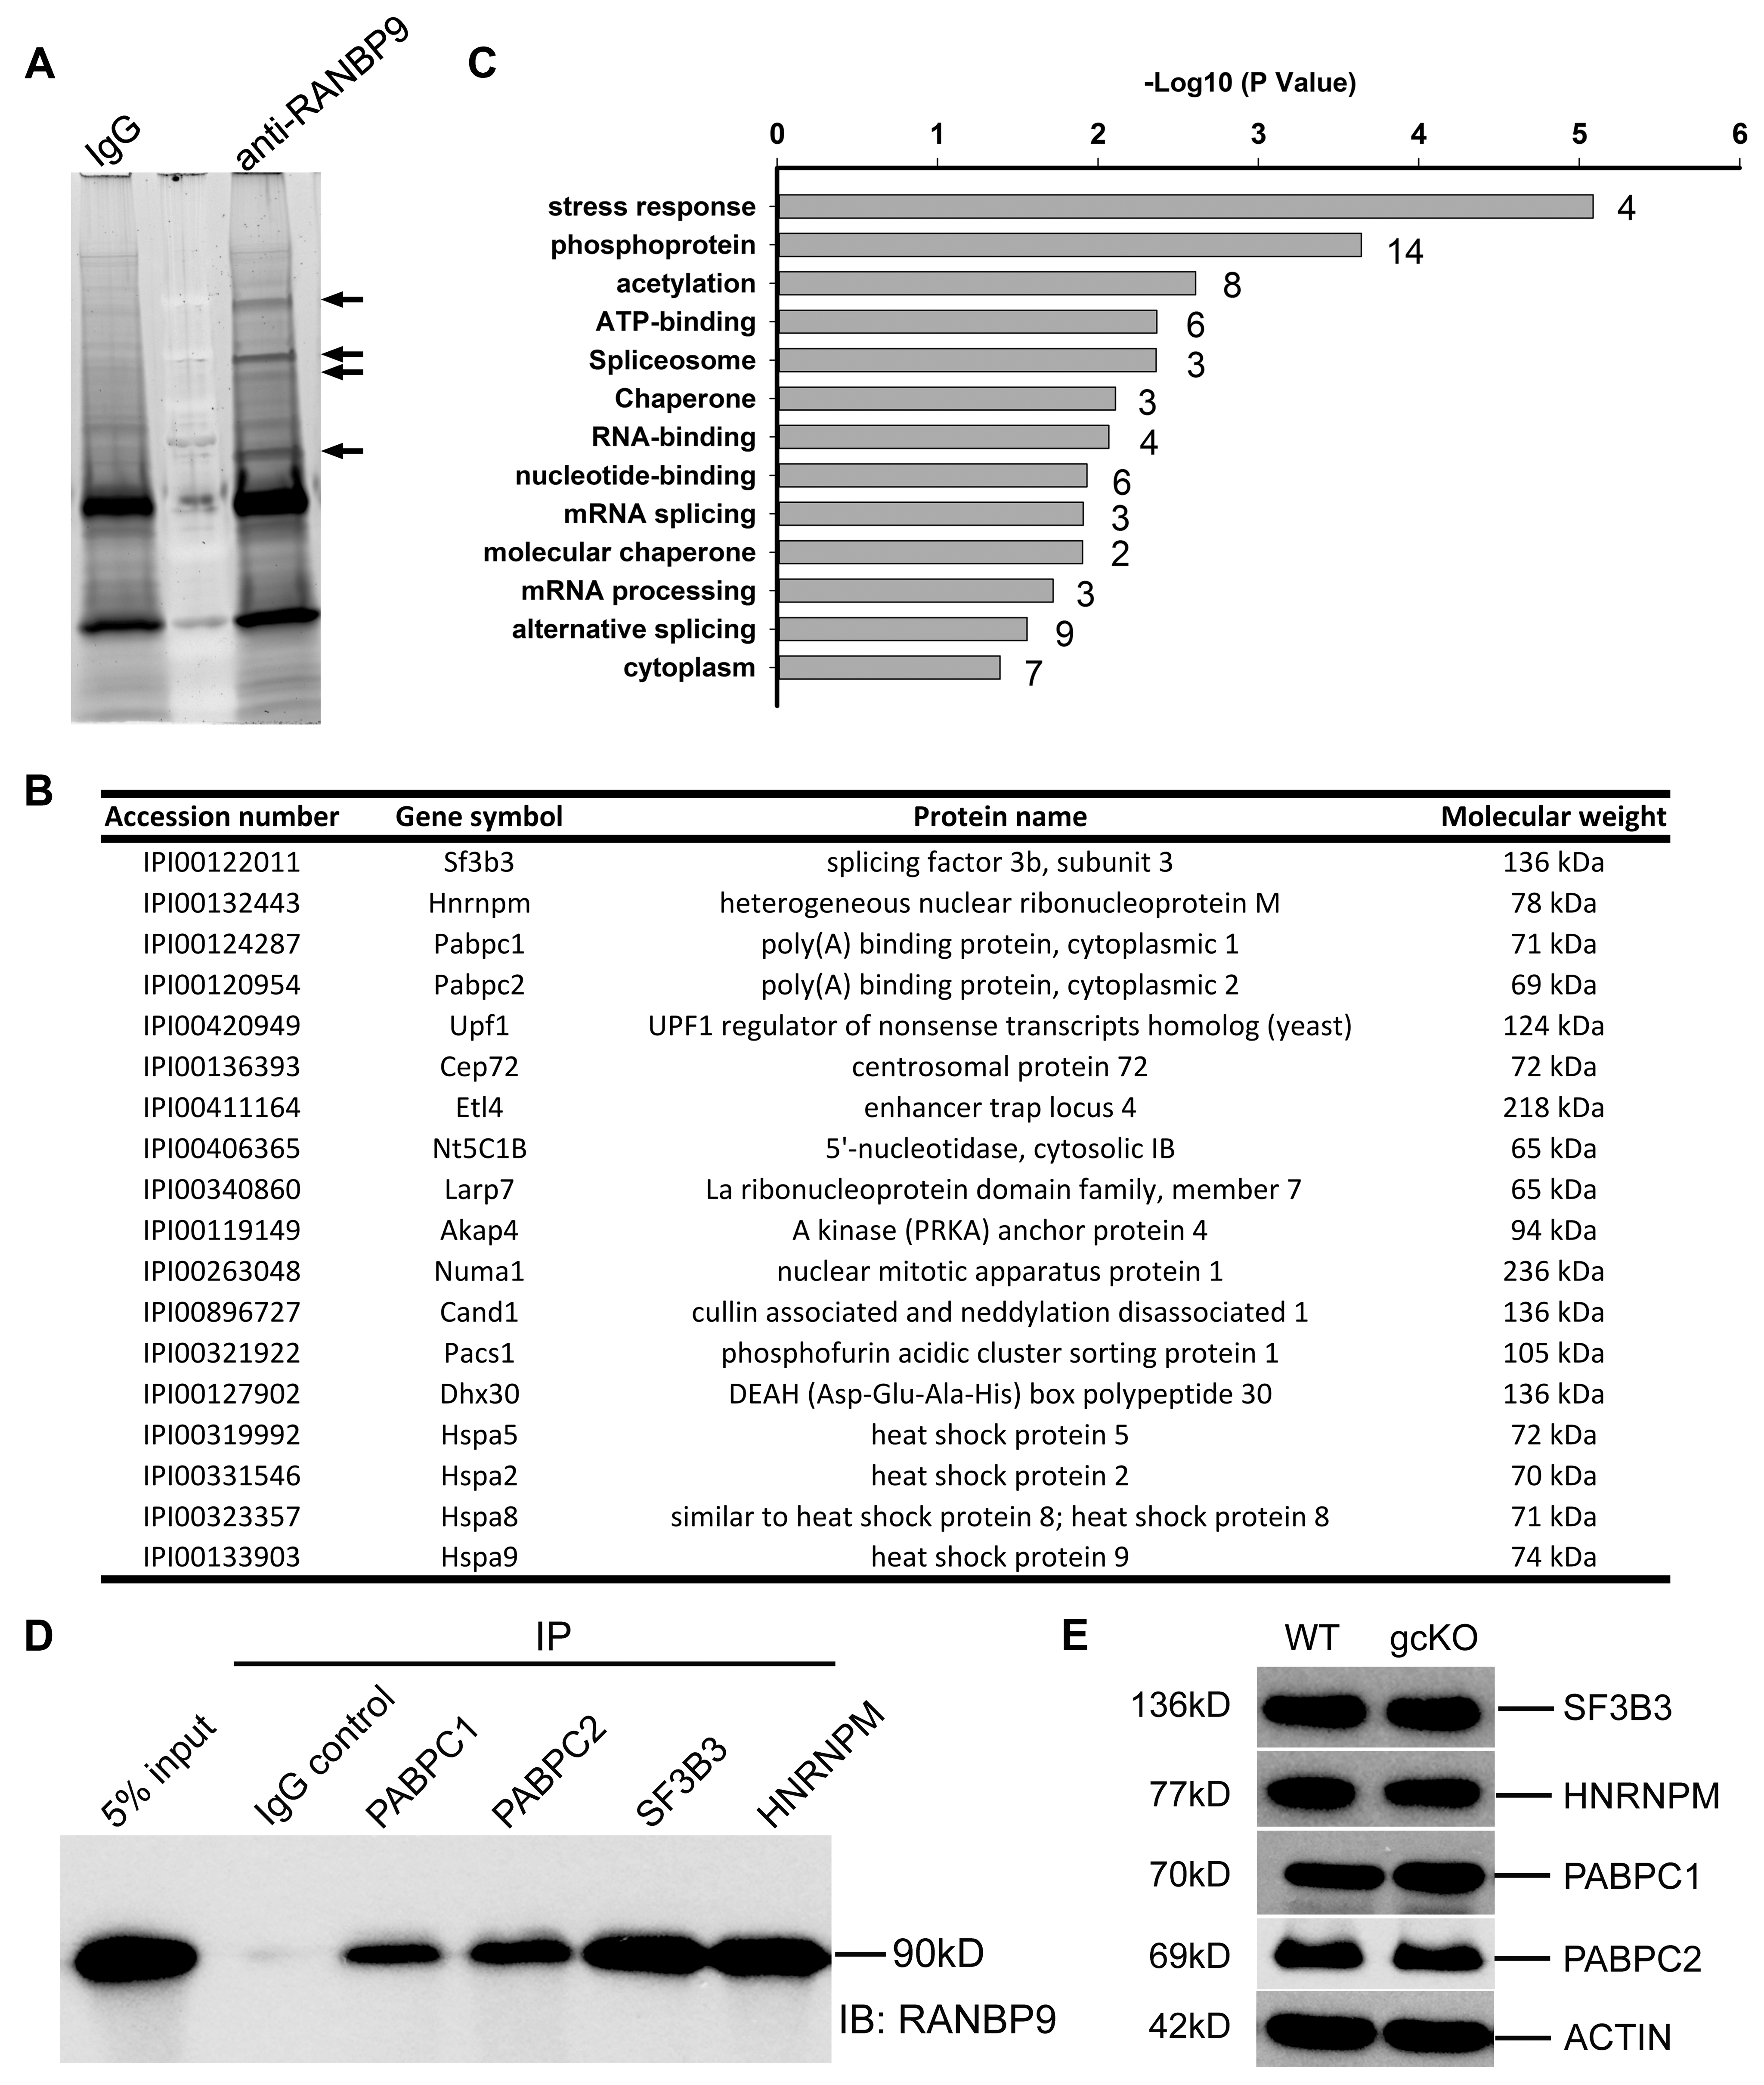 Identification of RANBP9-interacting partners in murine testes using immunoprecipitation followed by mass spectrometry (IP-MS).